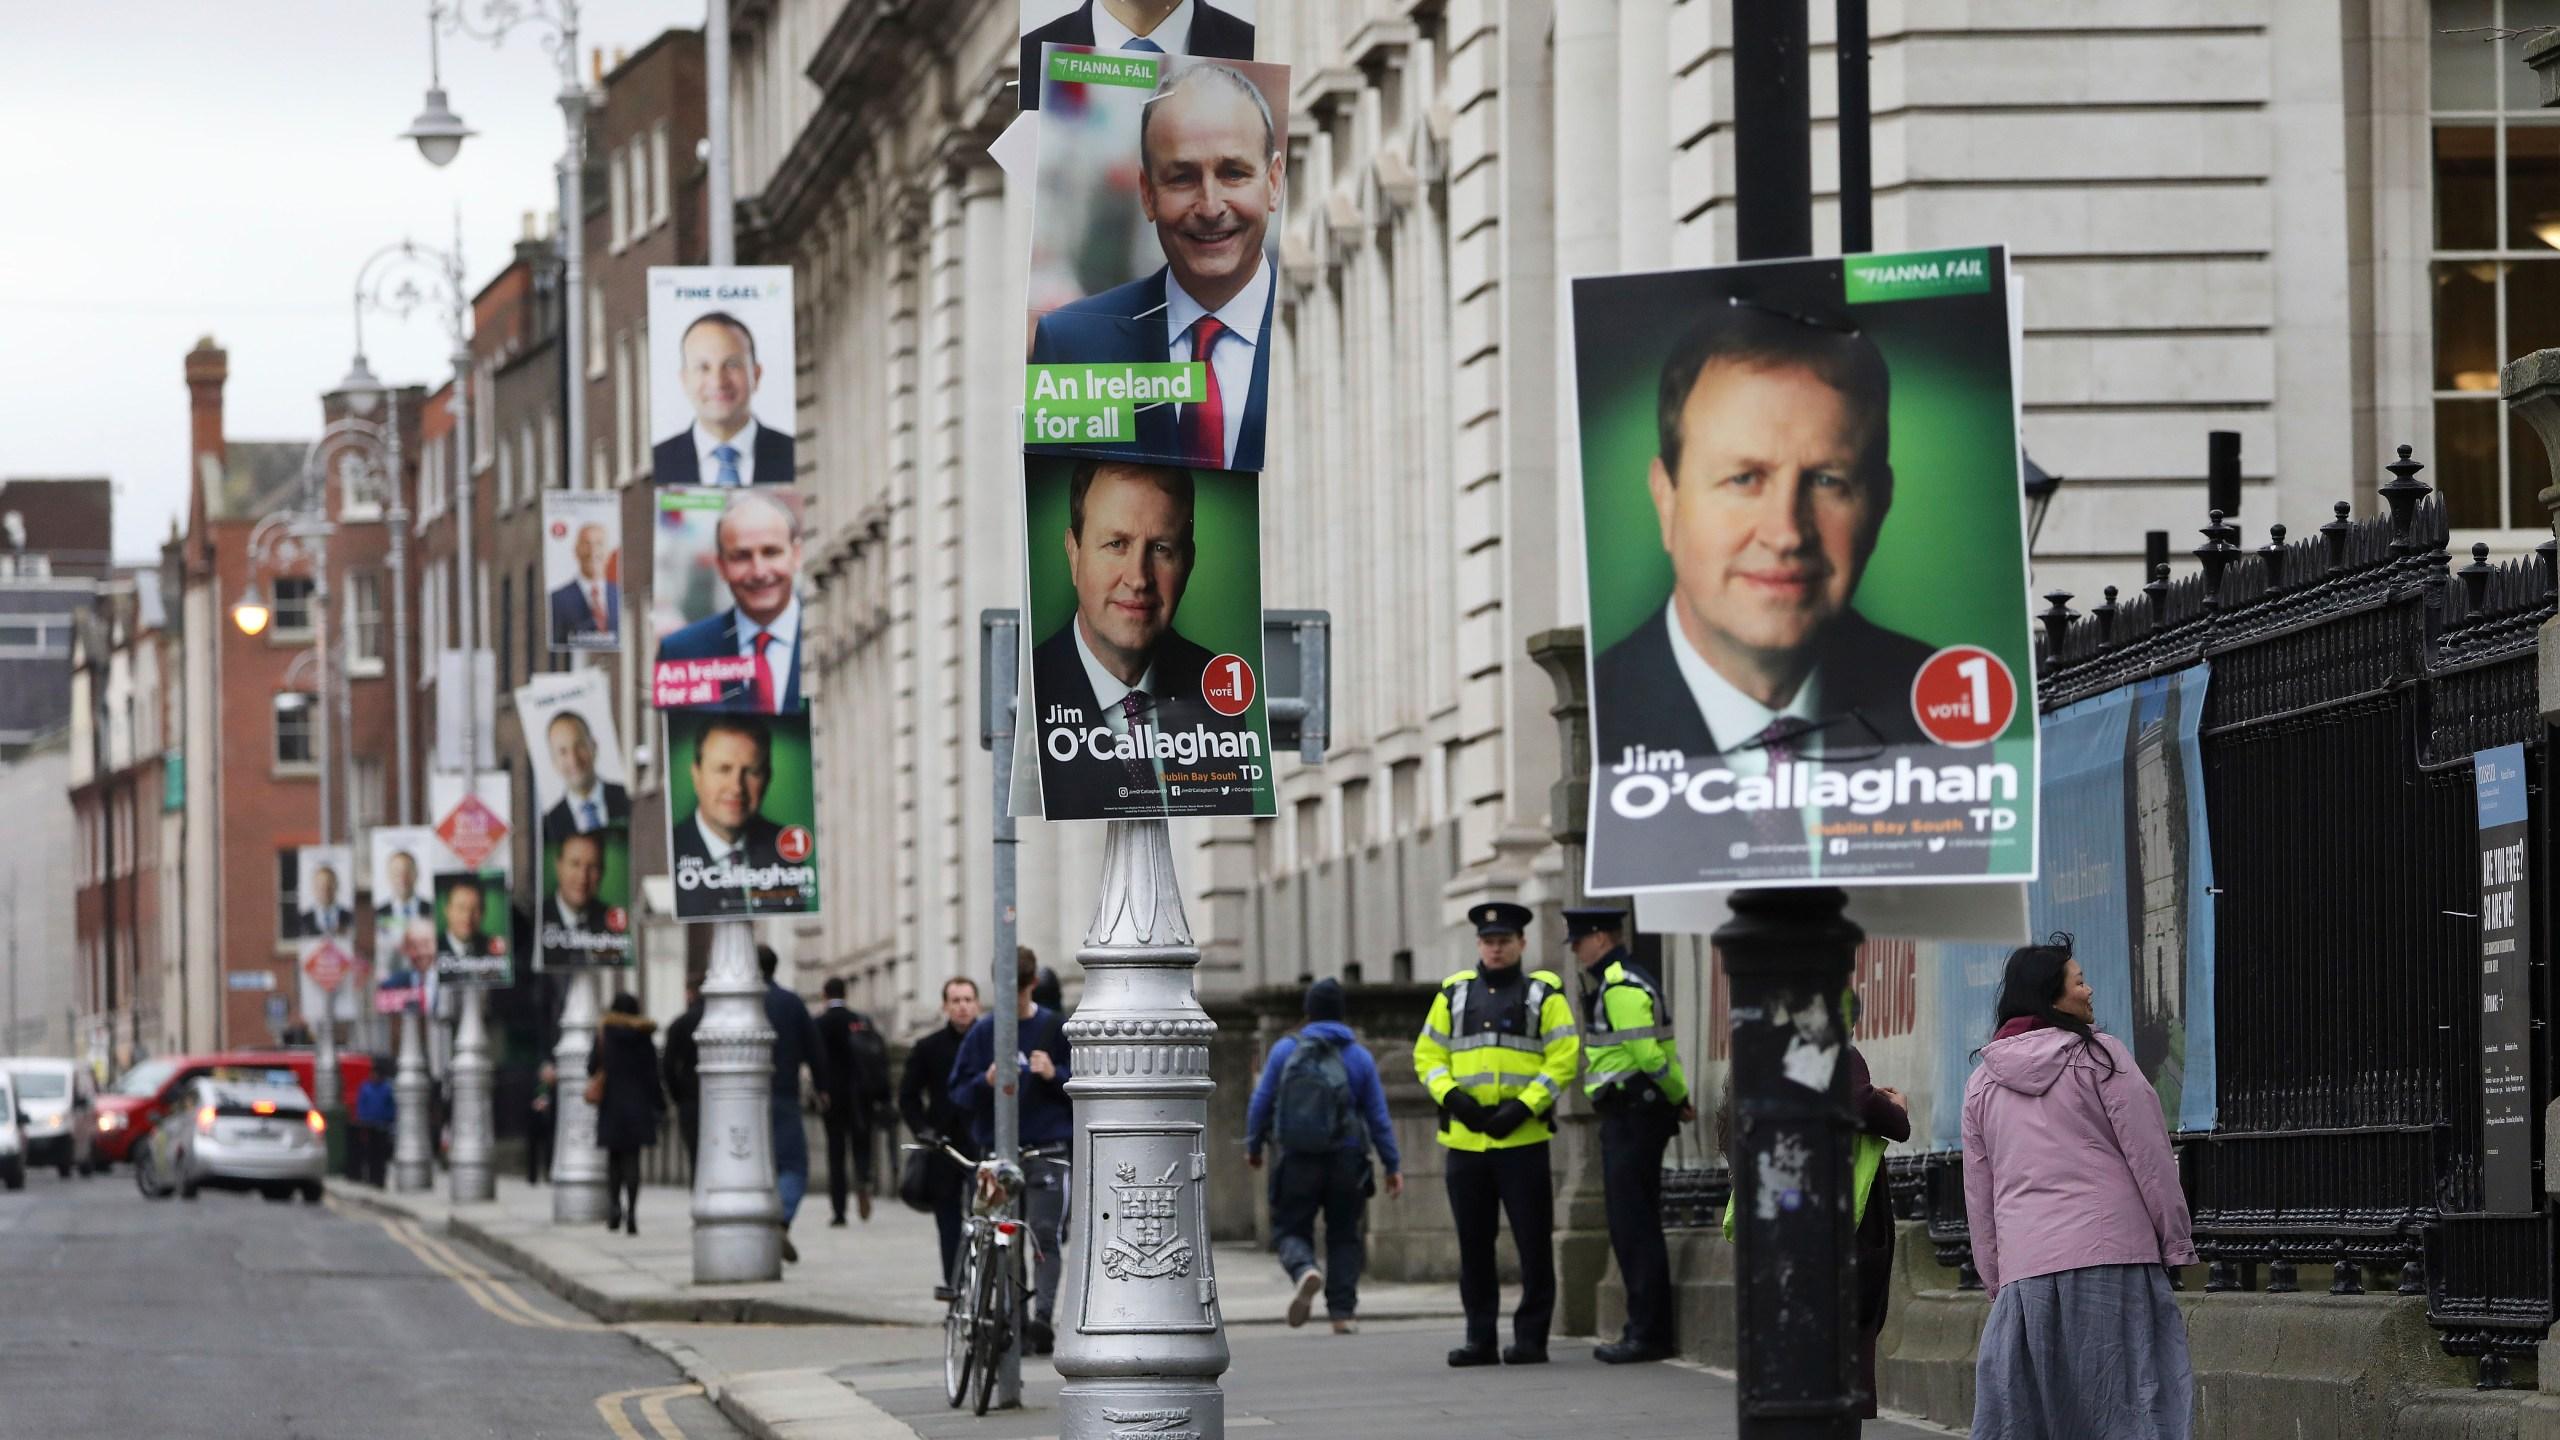 Top 3 parties in dead heat after Irish parliament elections | WTNH.com